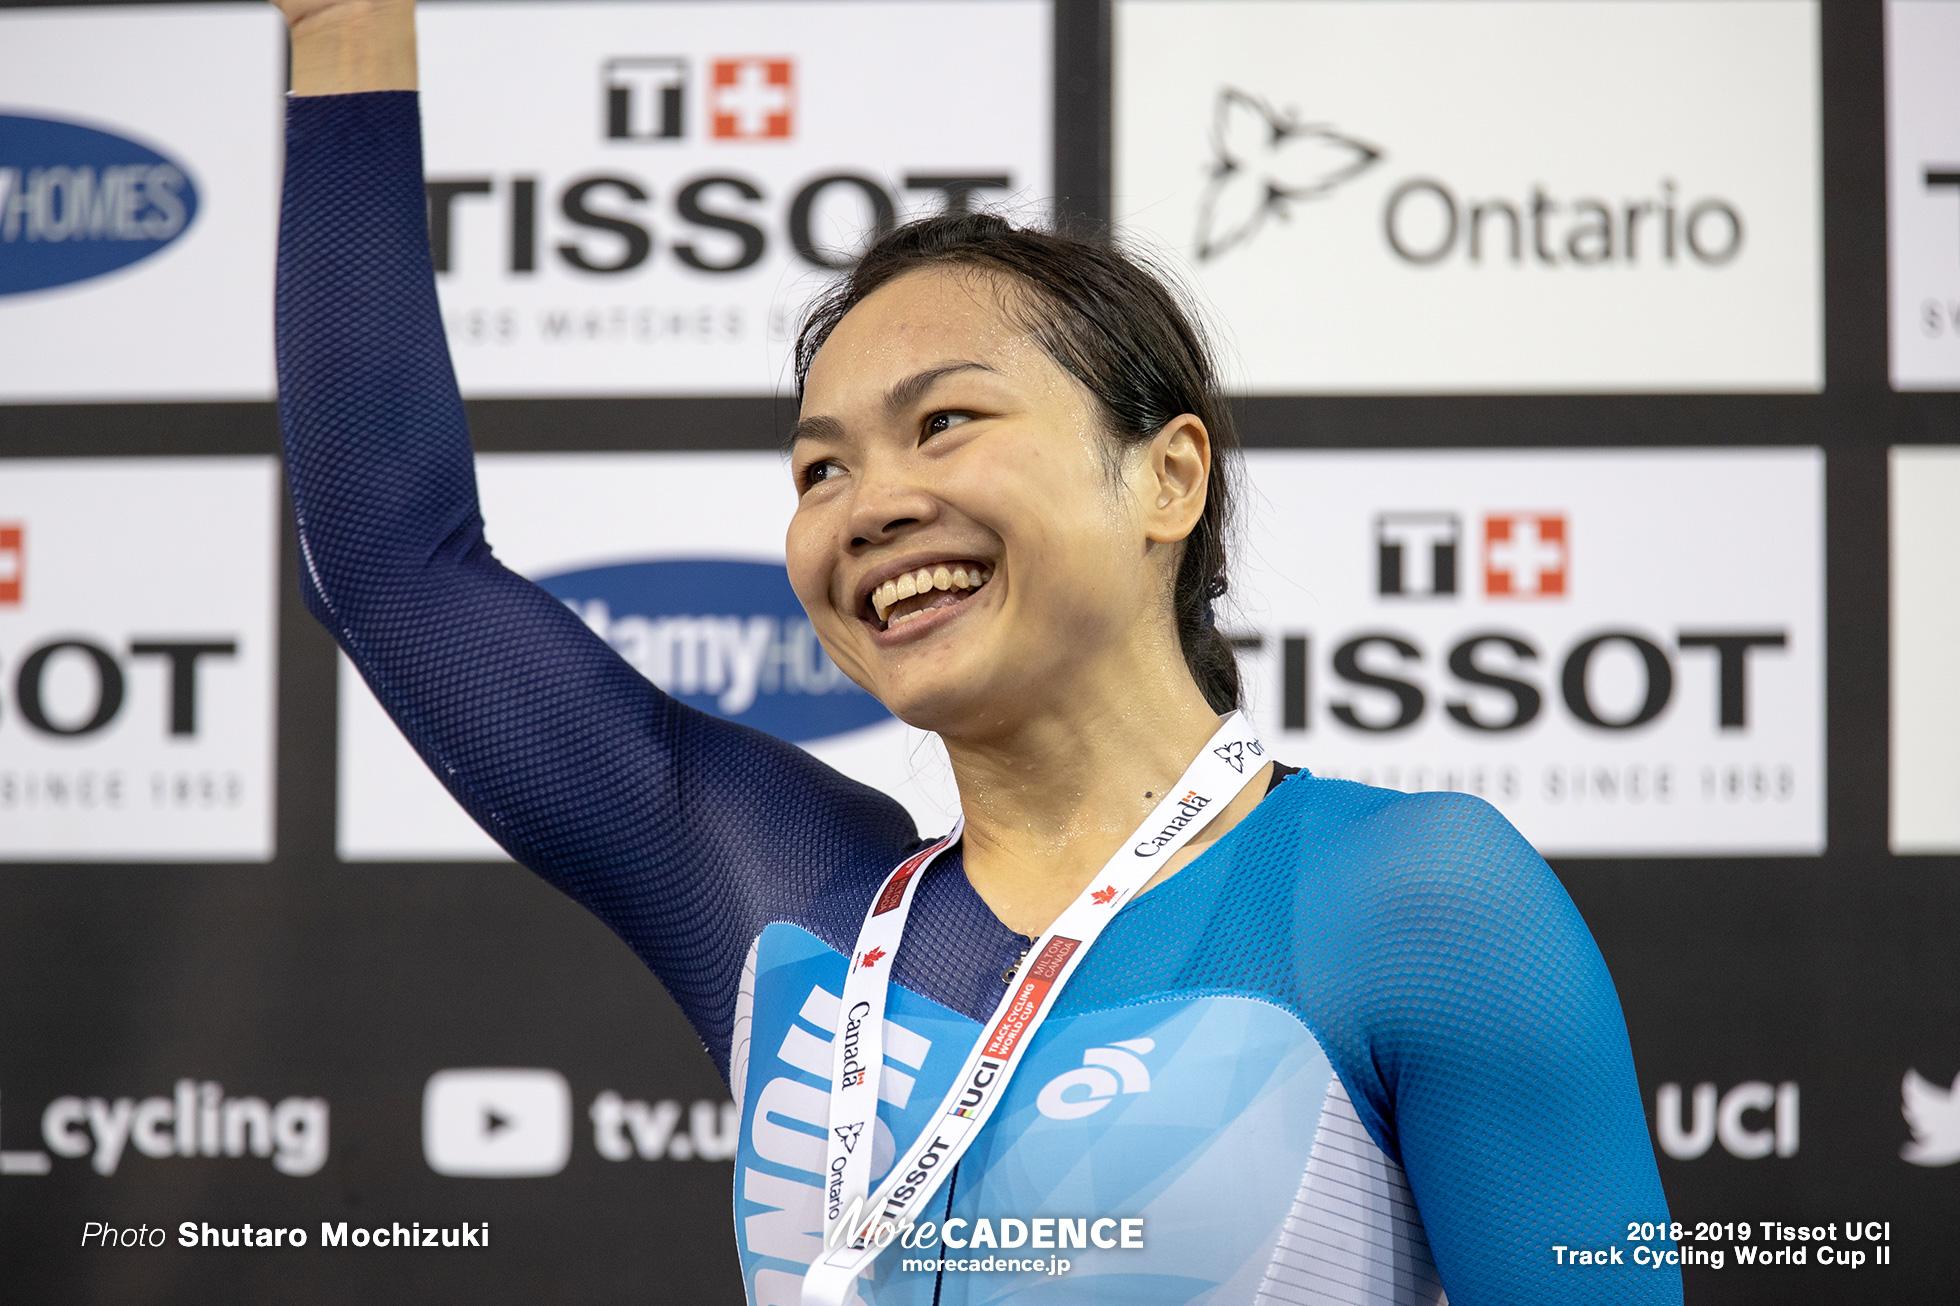 2018-2019 Tissot UCI Track Cycling World Cup II Women's Sprint Final